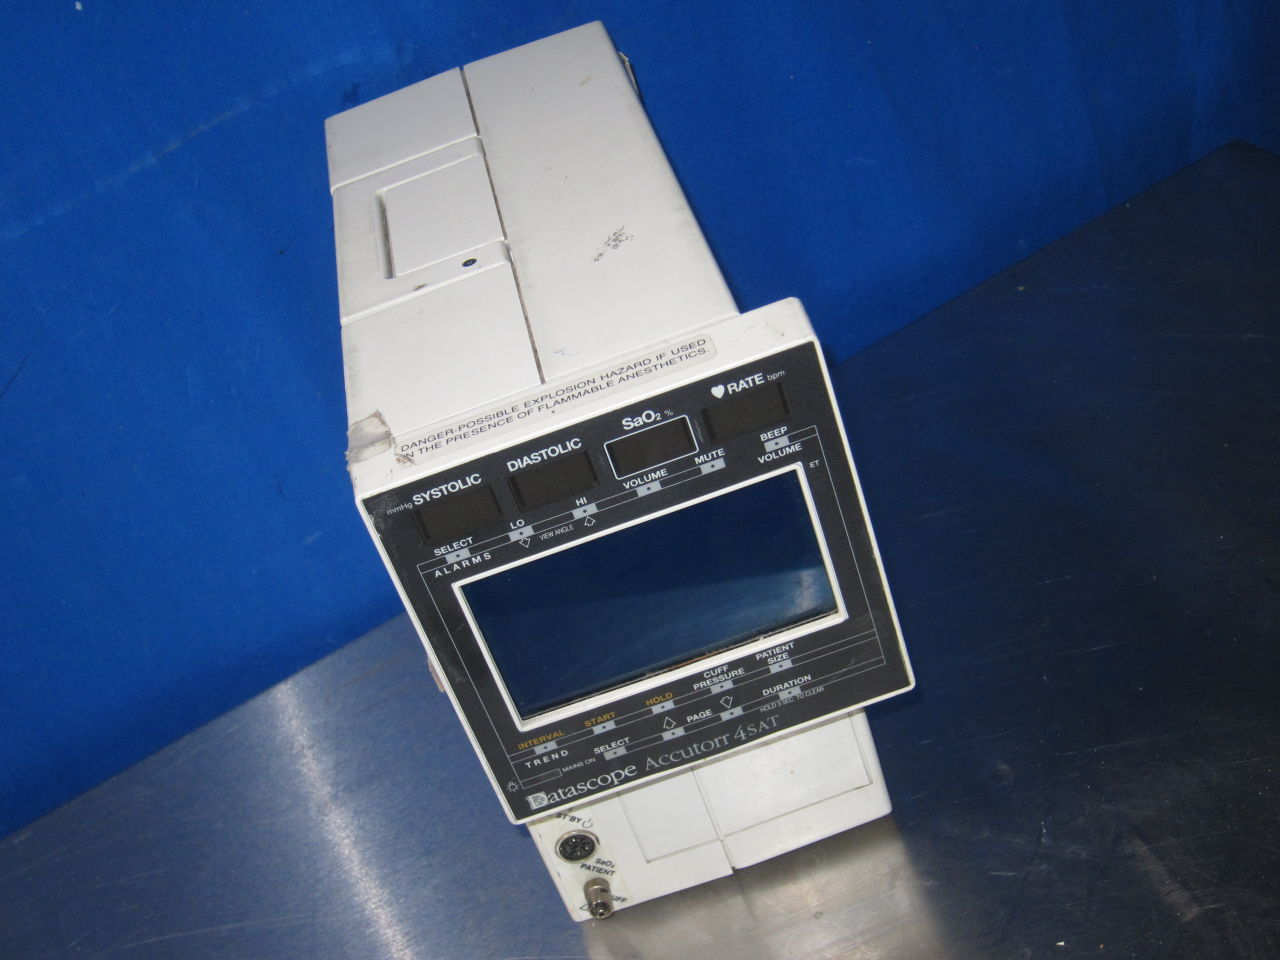 DATASCOPE Accutorr 3, 4 Series Monitor